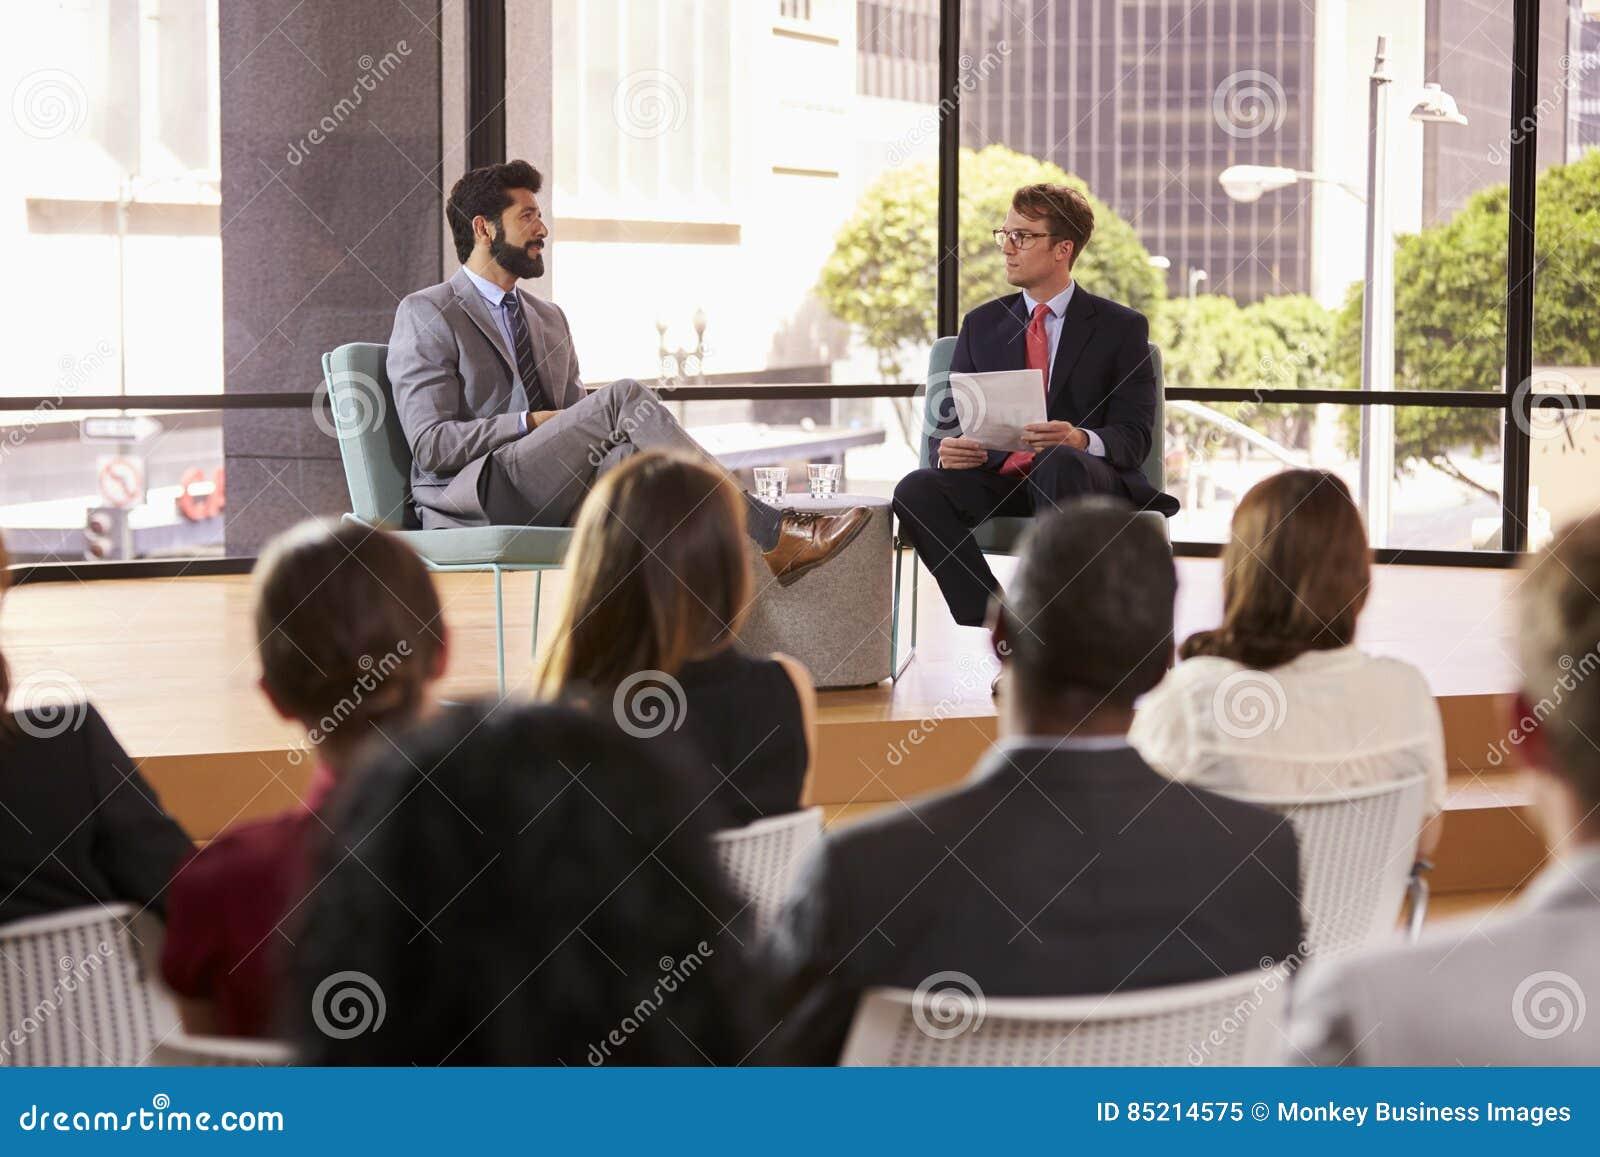 Диктор и интервьюер перед аудиторией на семинаре